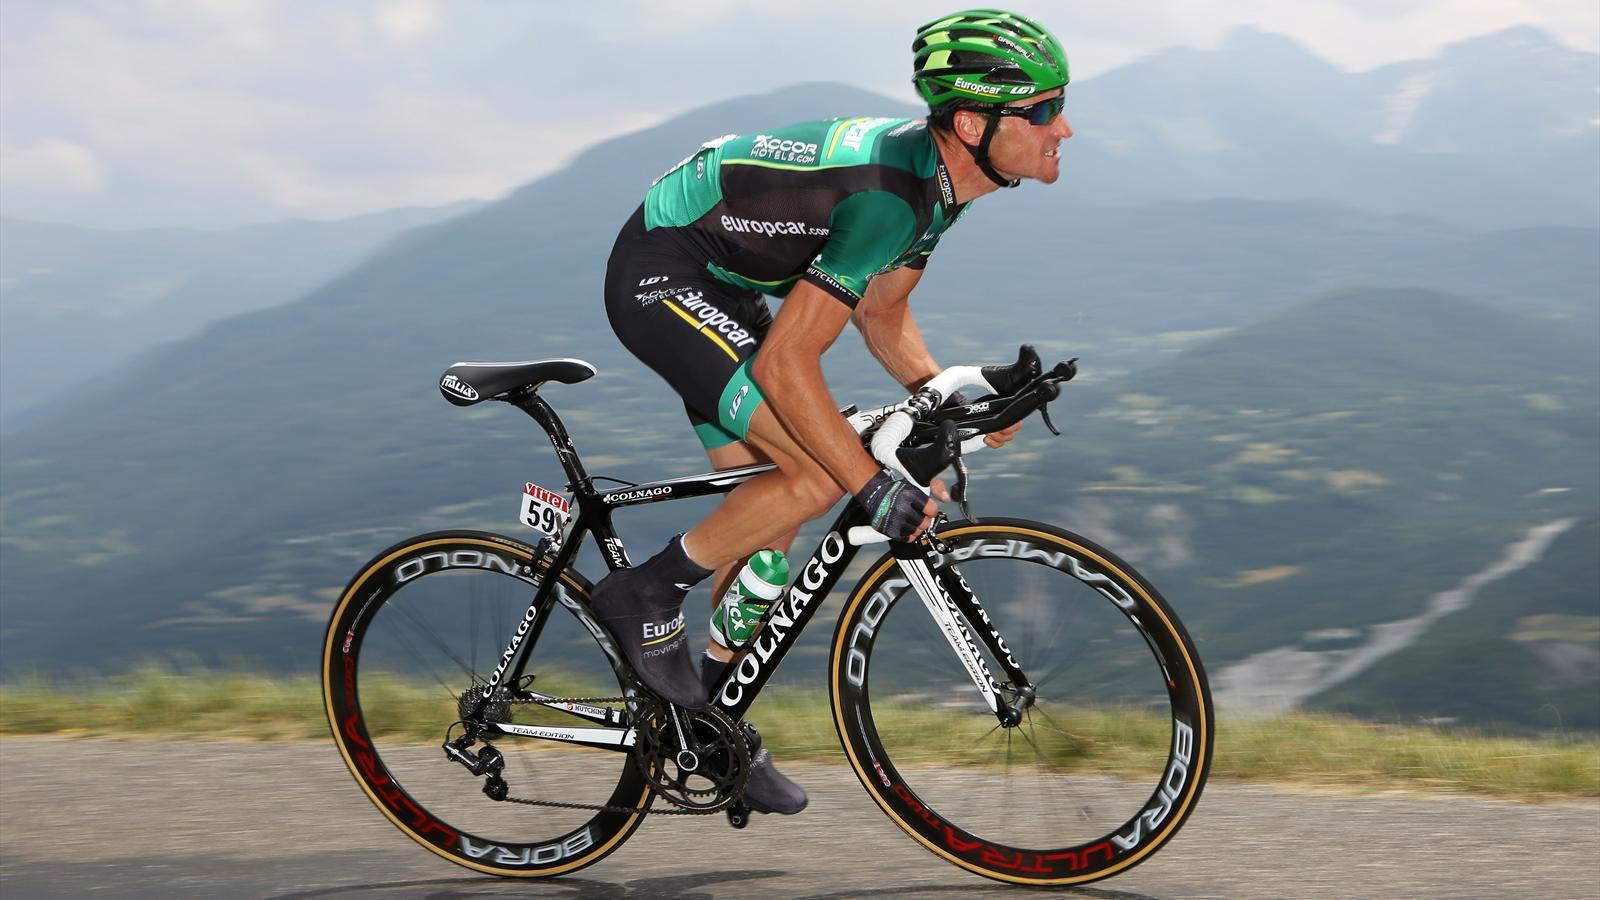 paris nice voeckler en leader pour europcar paris nice 2014 cyclisme eurosport. Black Bedroom Furniture Sets. Home Design Ideas